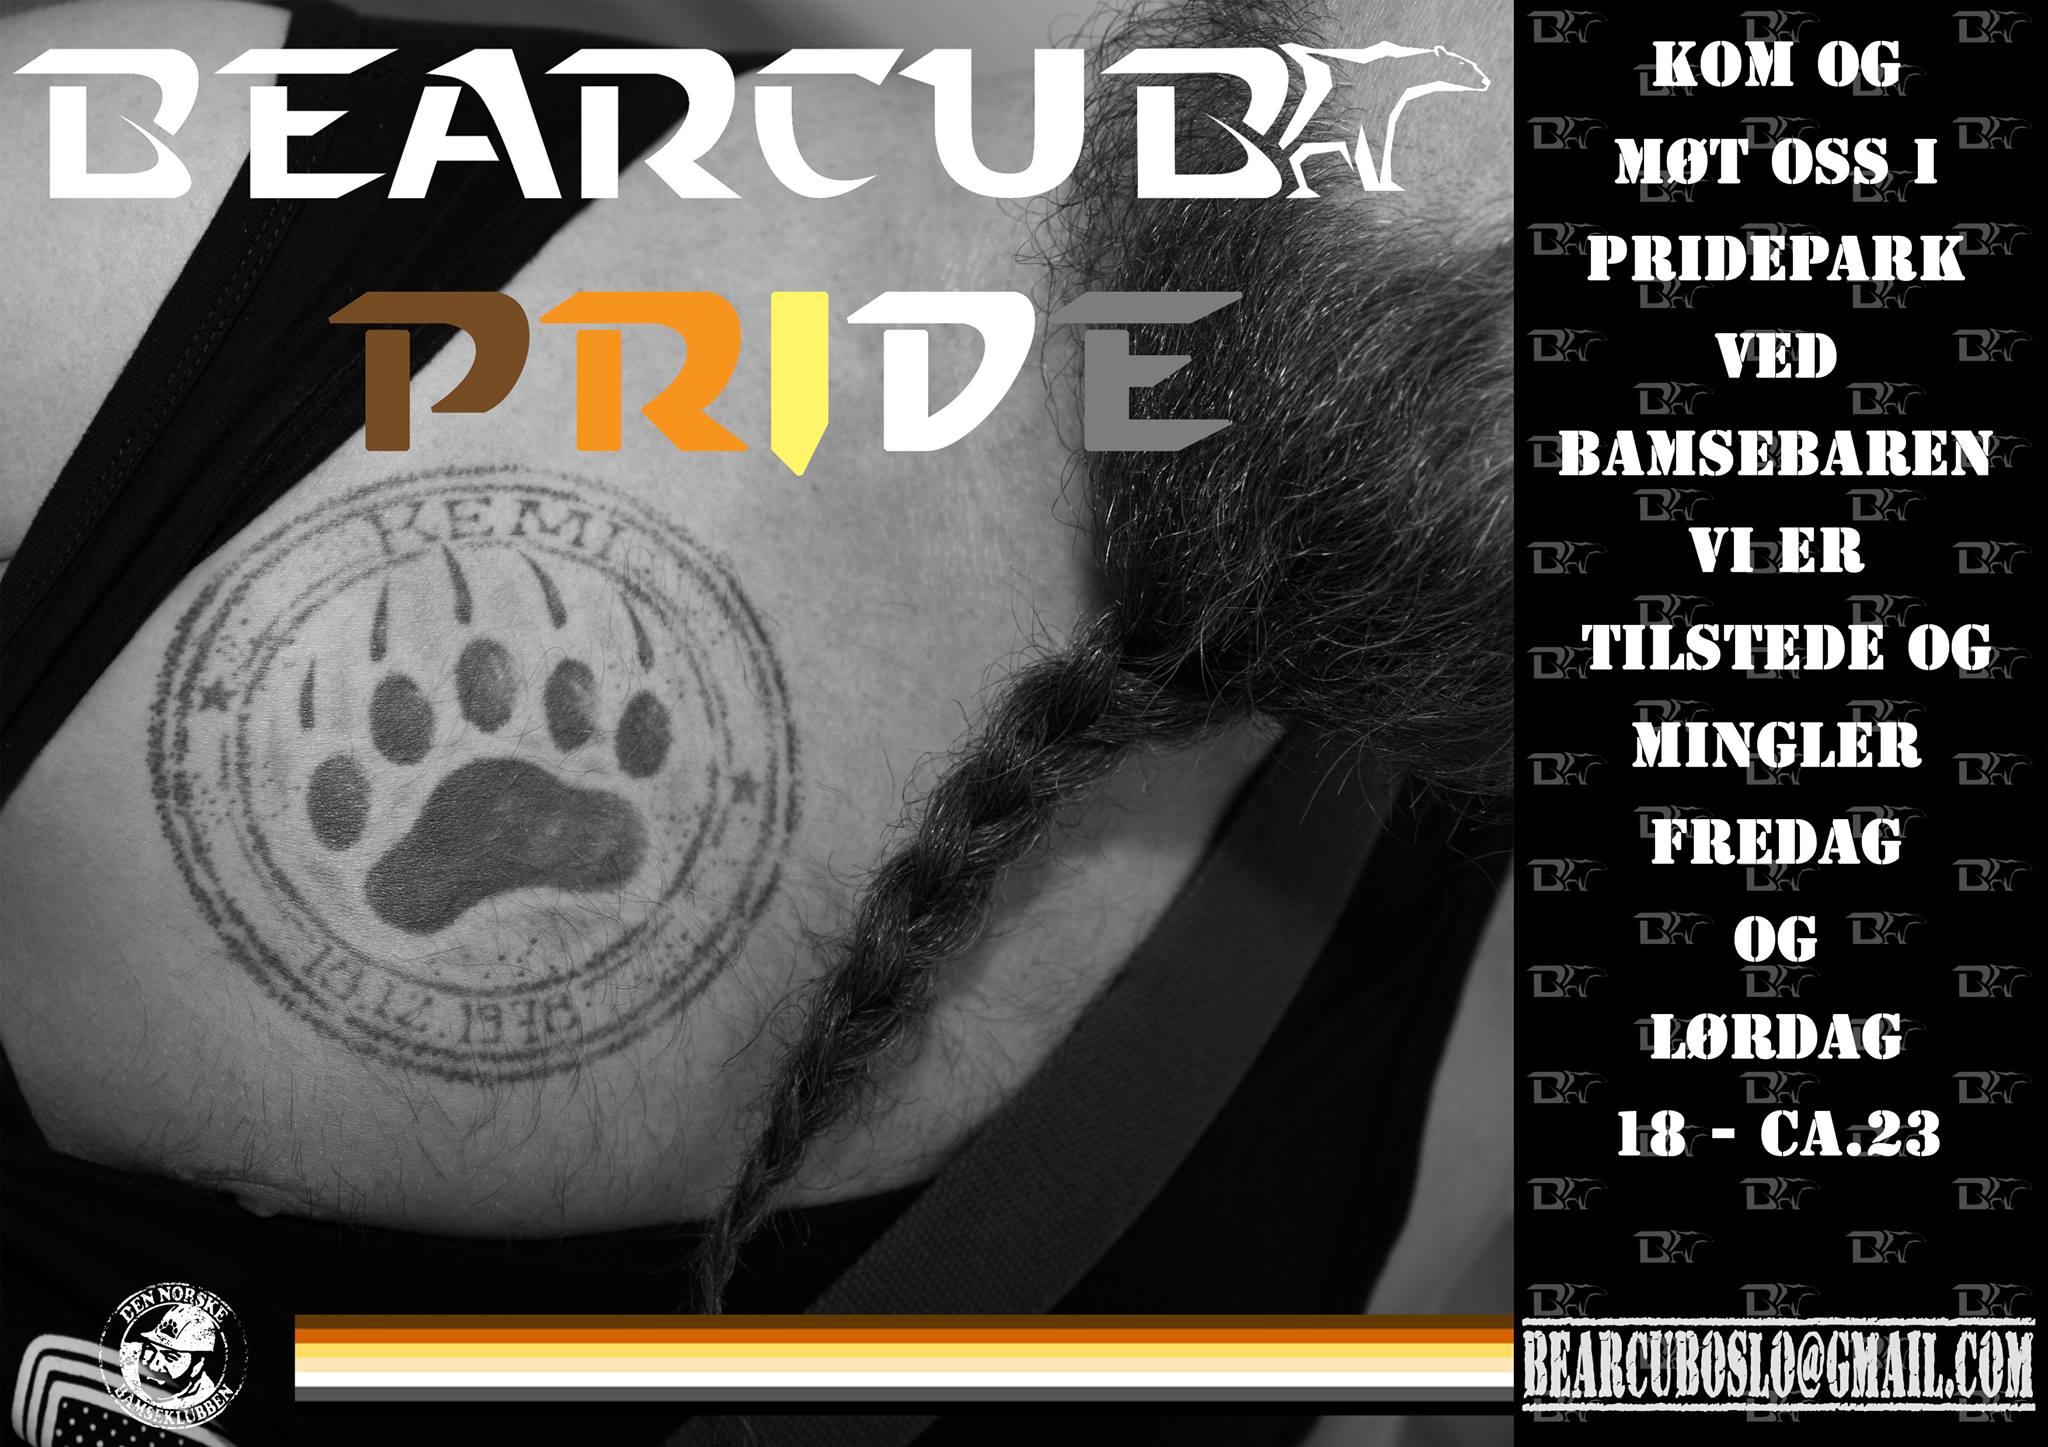 BearCub-Pride